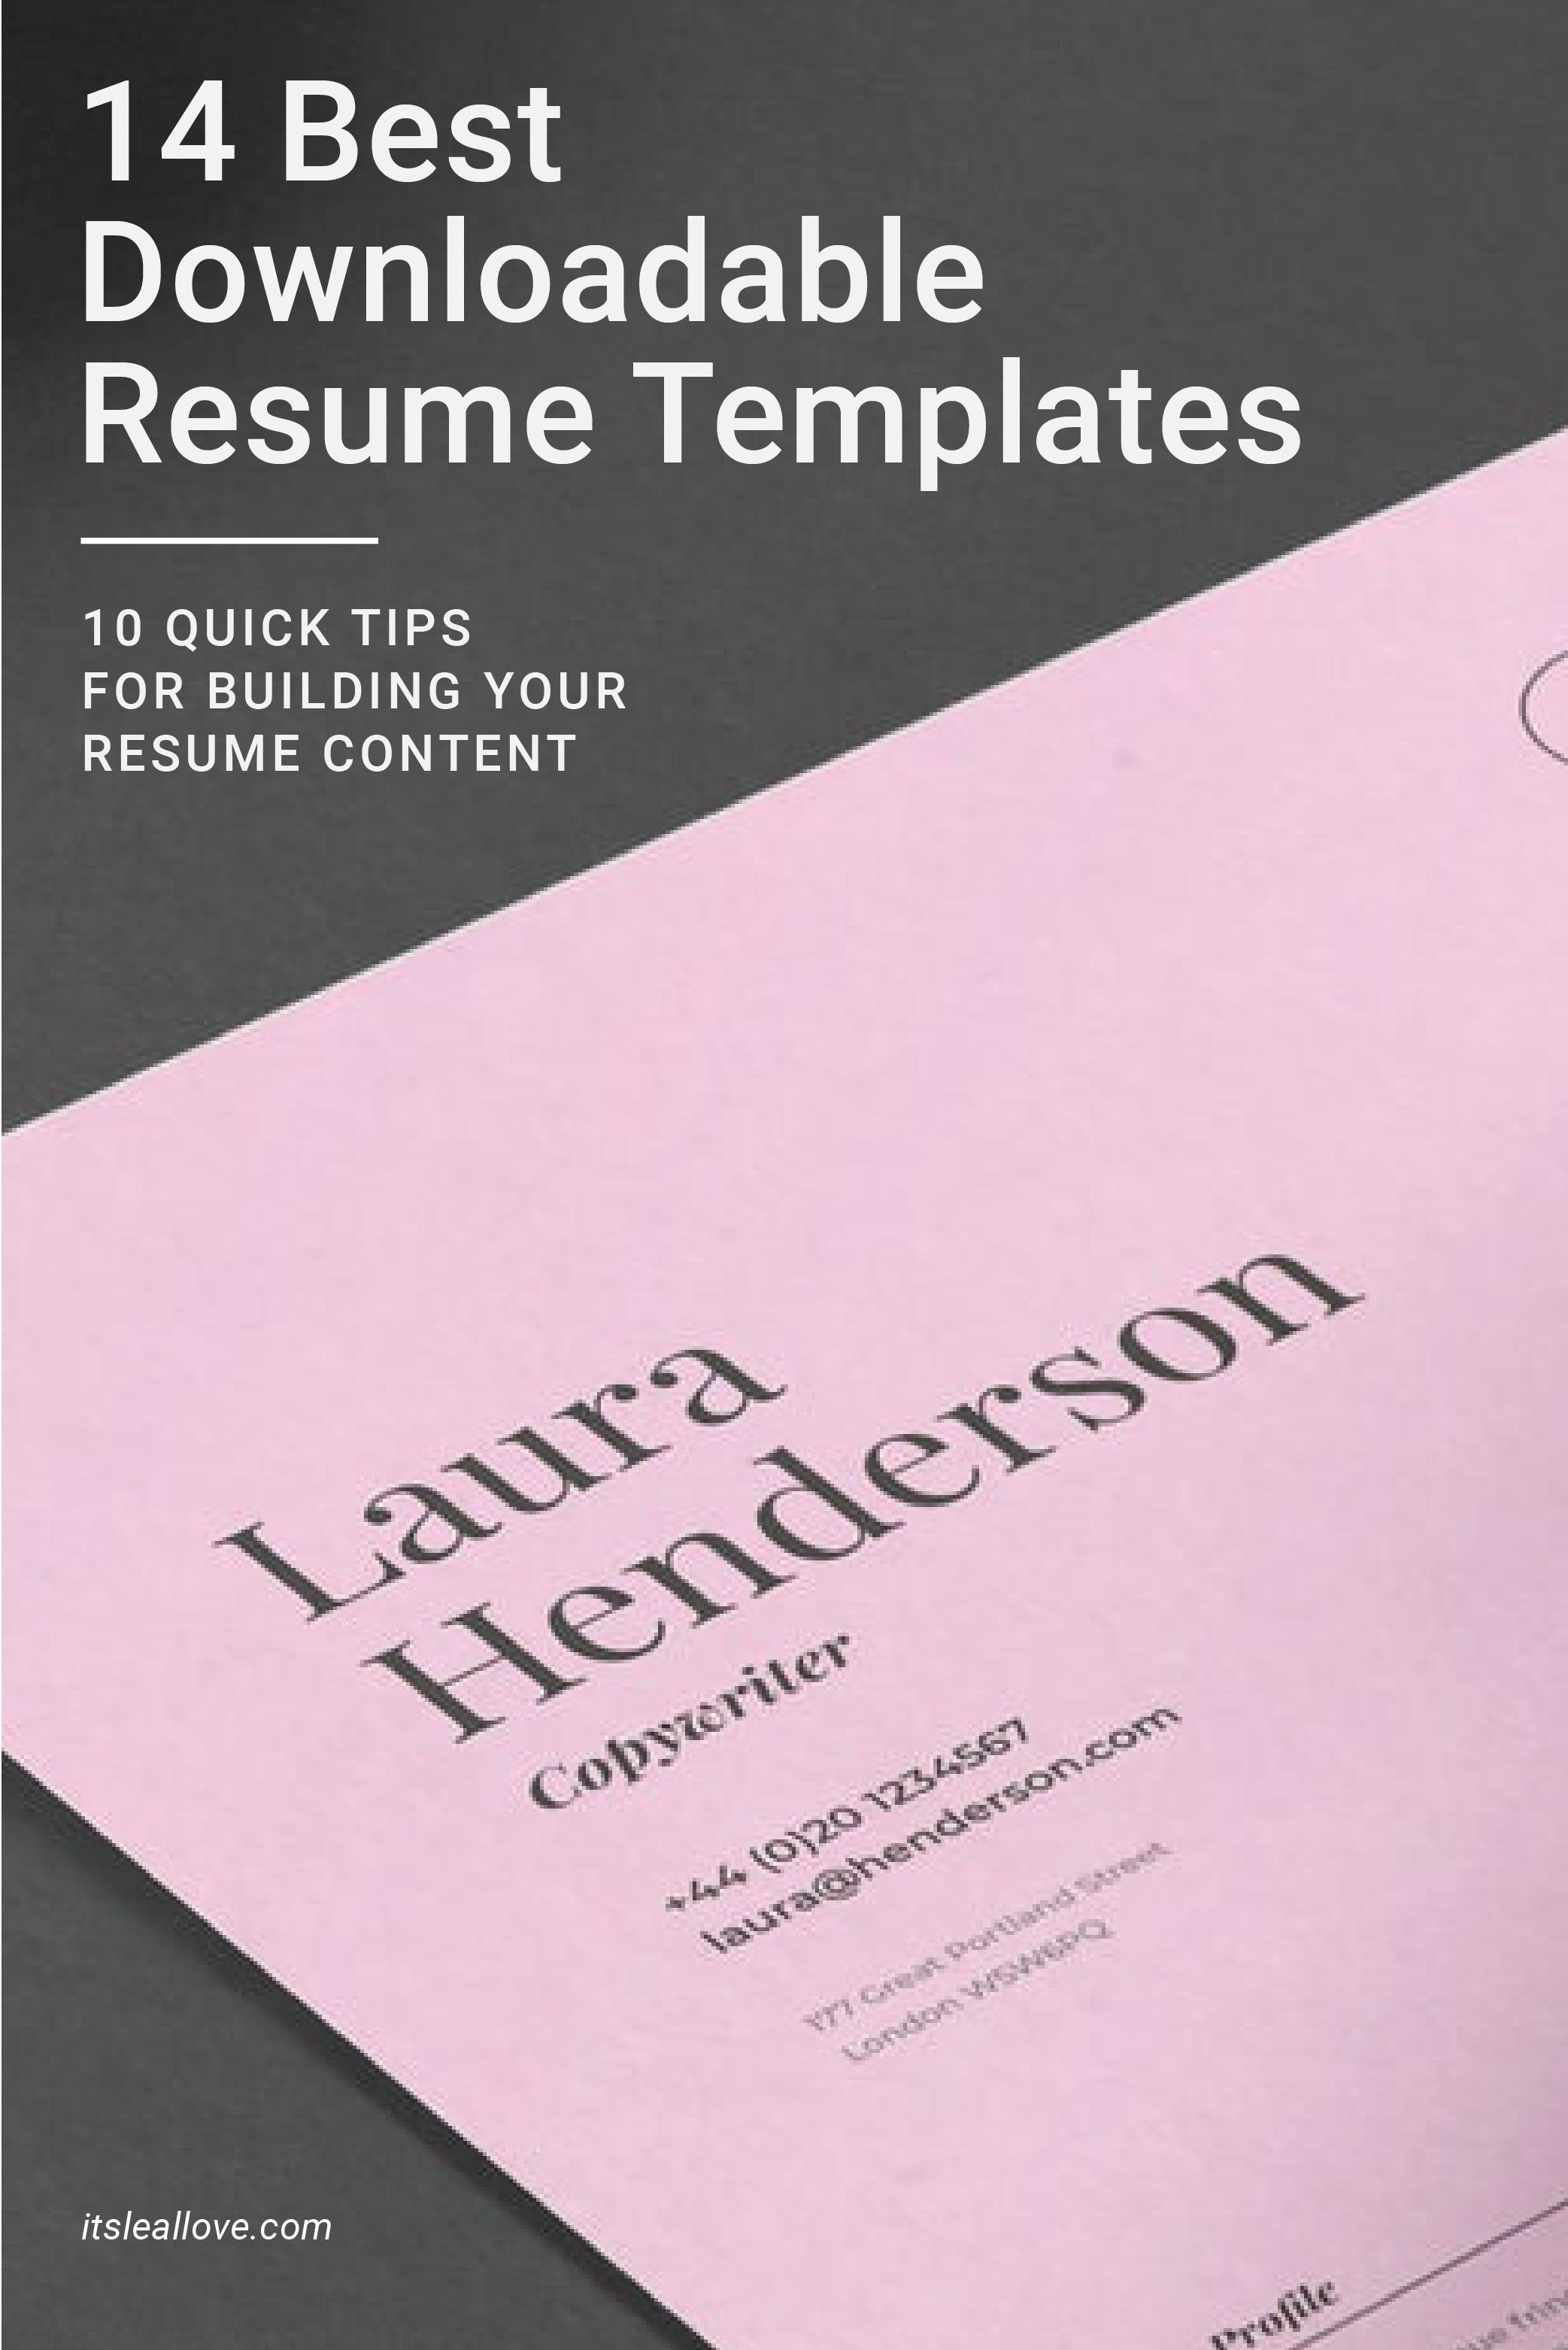 Pin on Job Search/Resume Writing